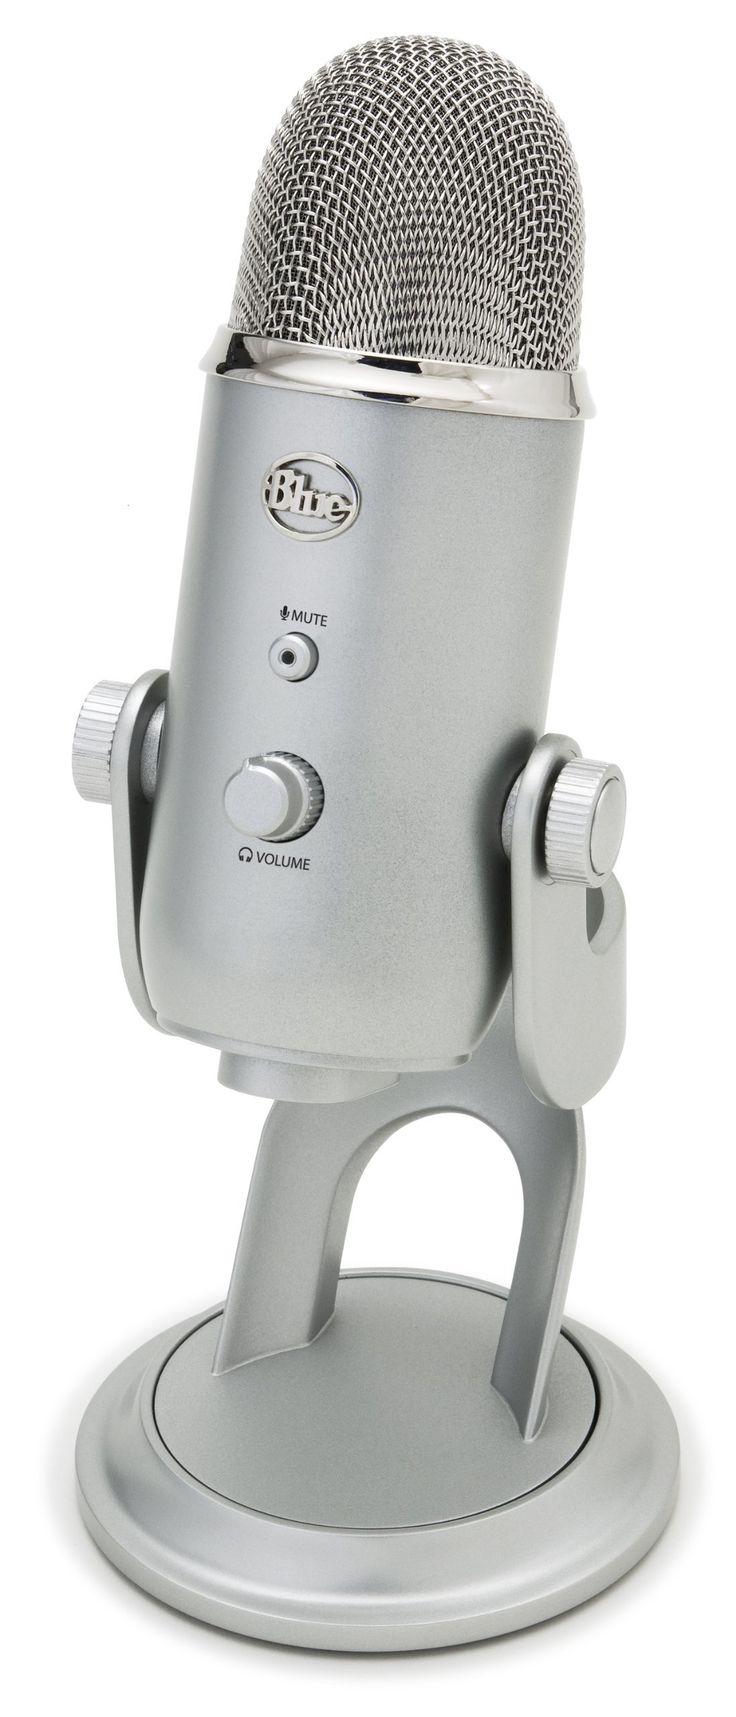 Amazon.com: Blue Yeti USB Microphone - Silver: Musical Instruments | @giftryapp